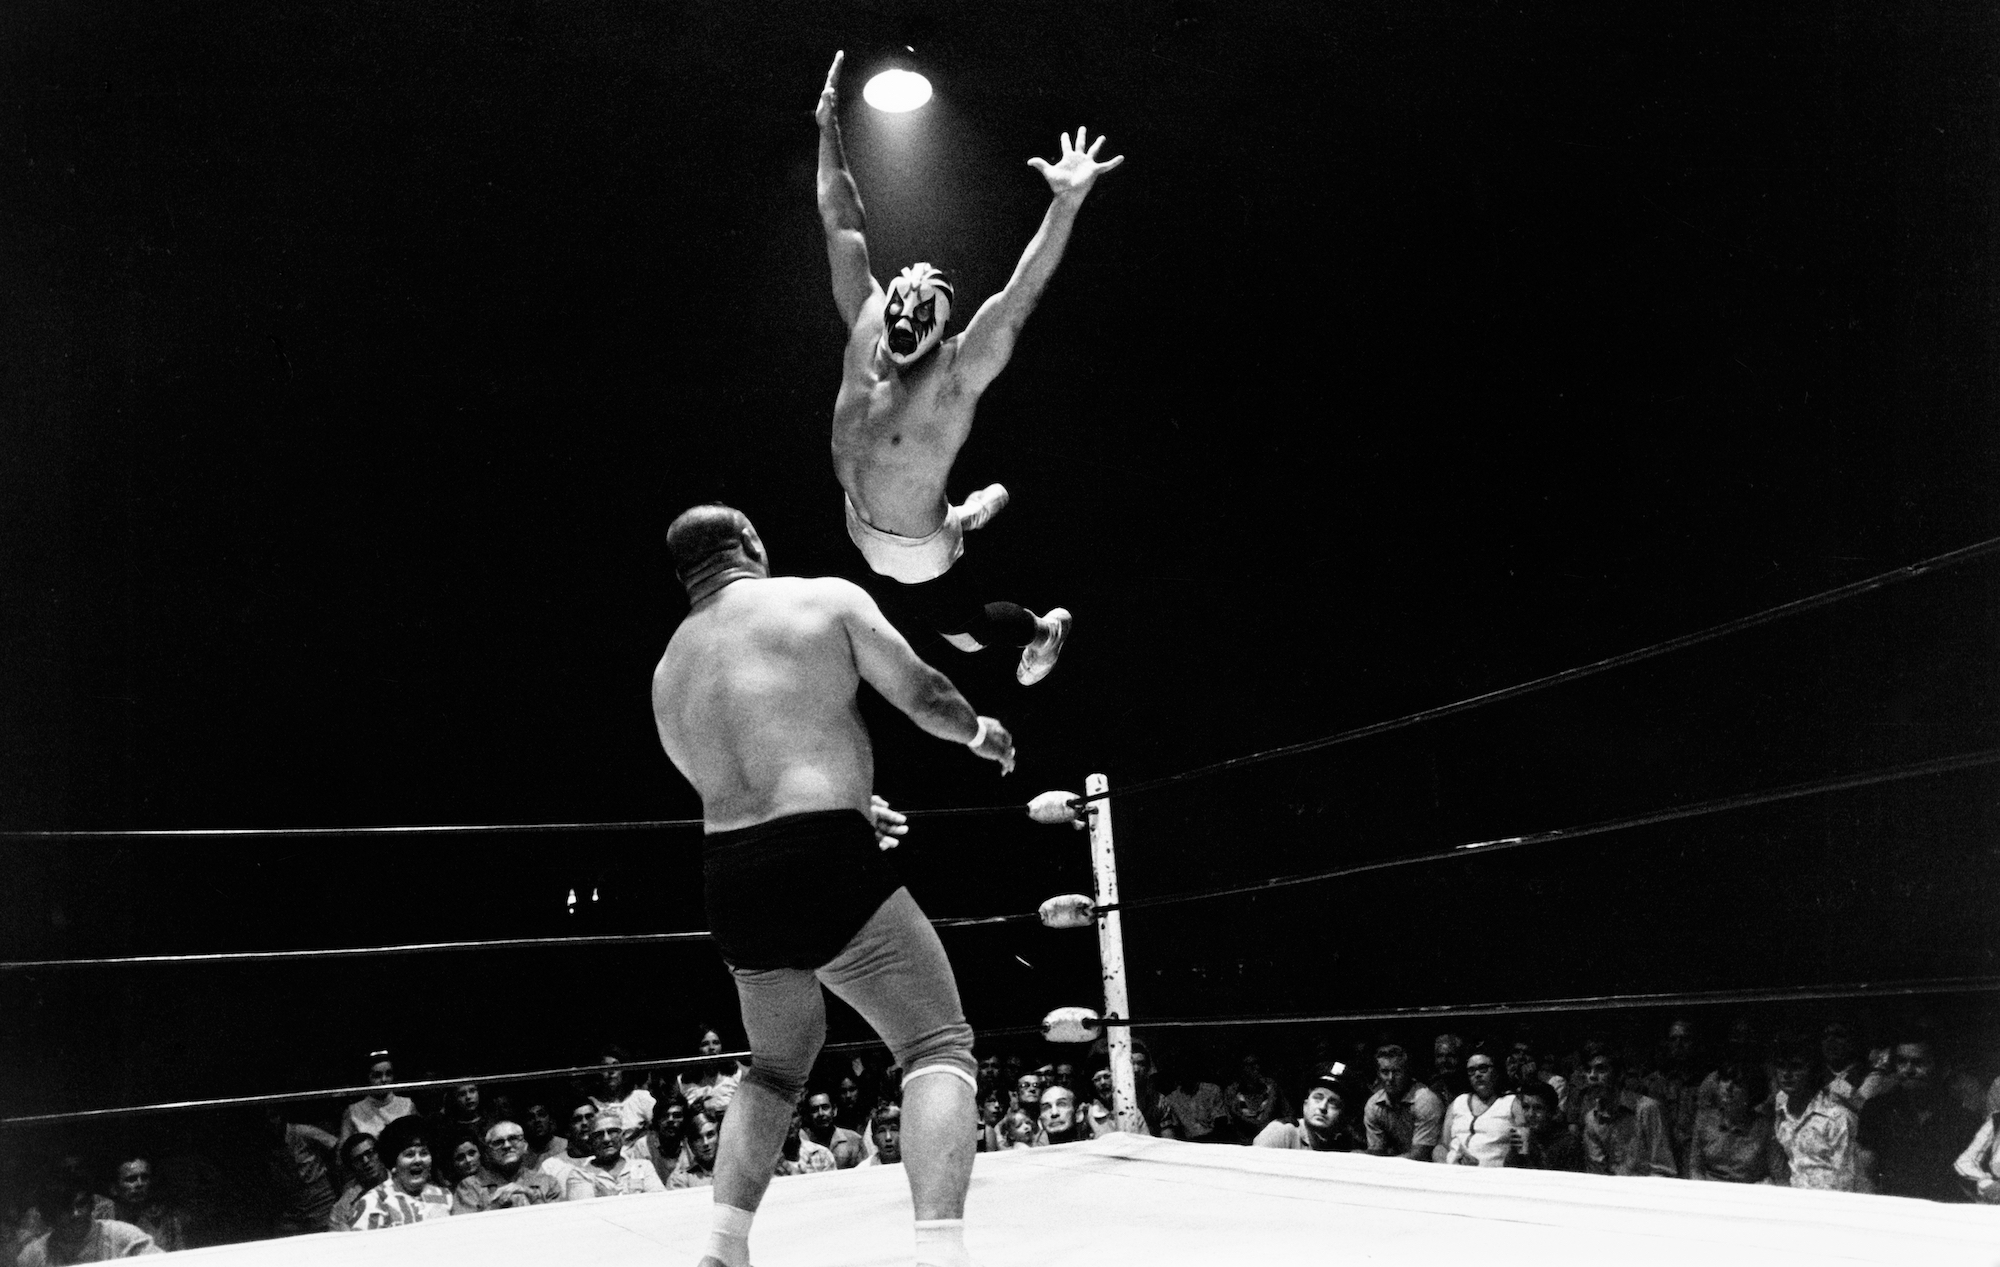 Mil Máscaras finishes Professor Toru Tanaka with a flying body press.